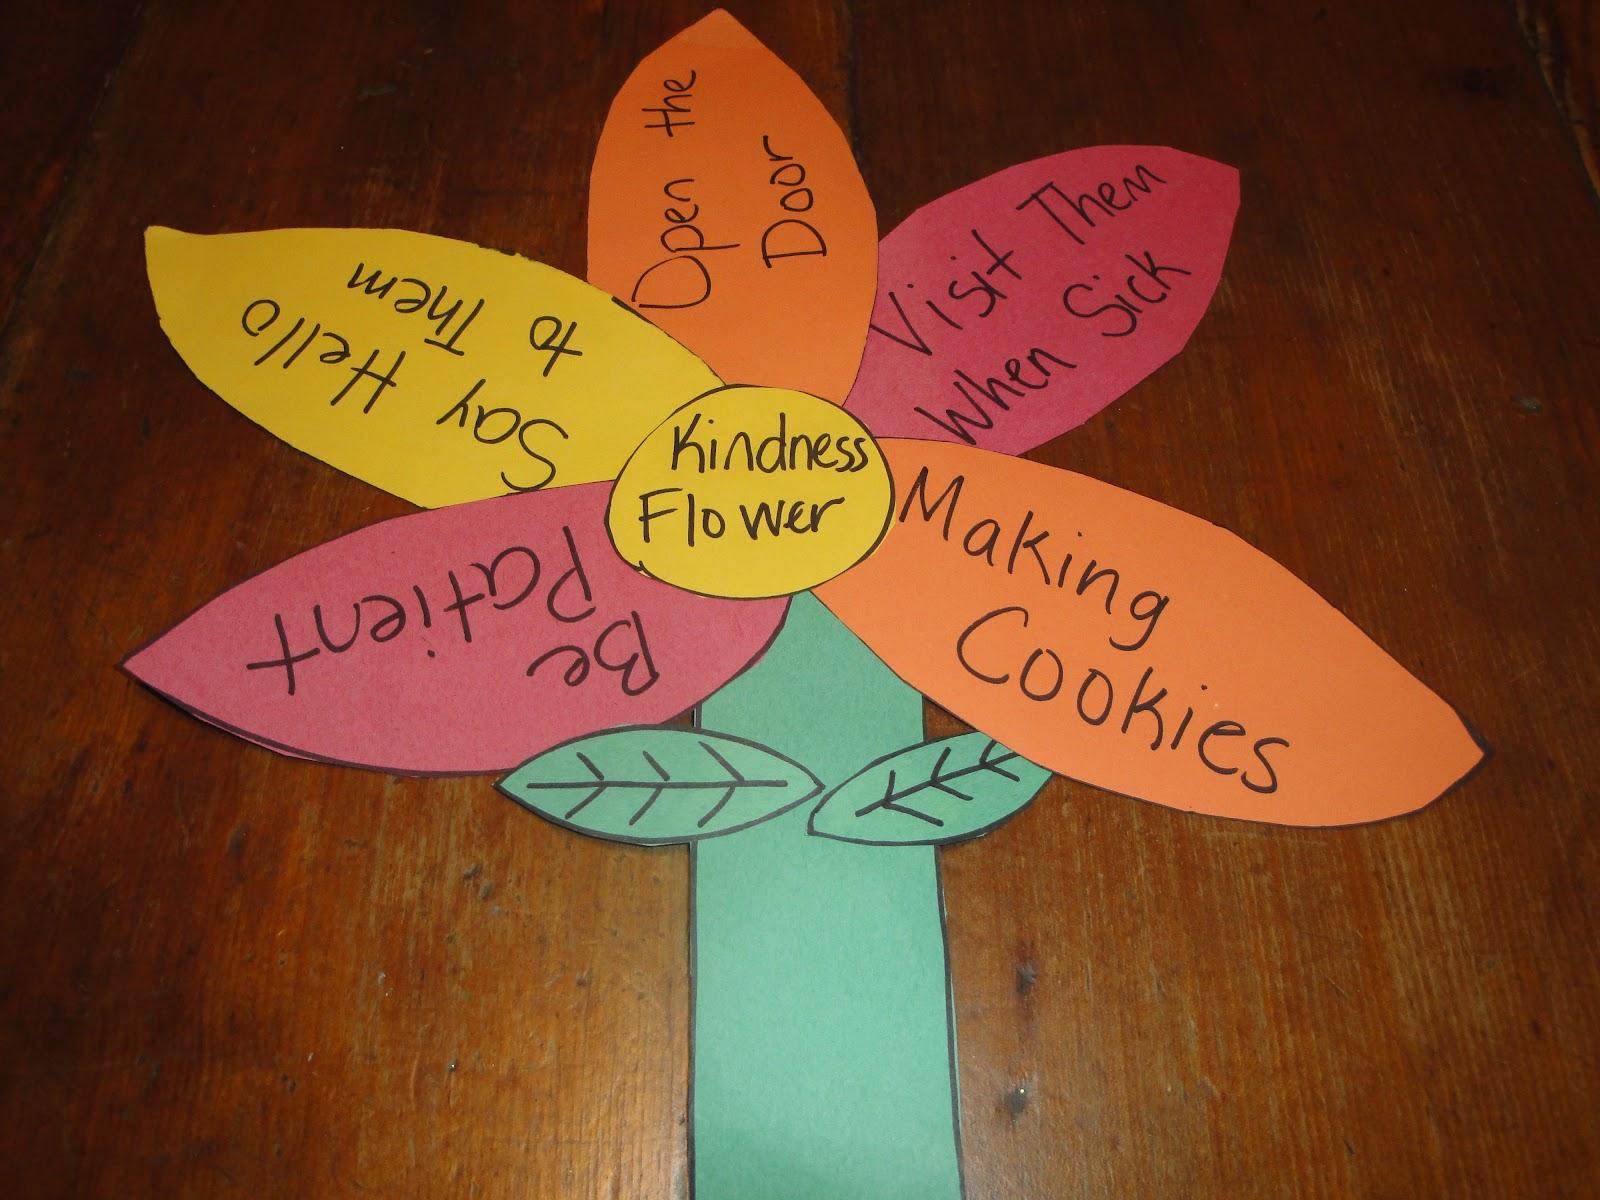 Kindness crafts for preschoolers - Bible Crafts For 2 Year Olds Bible Crafts For 2 Year Olds 0